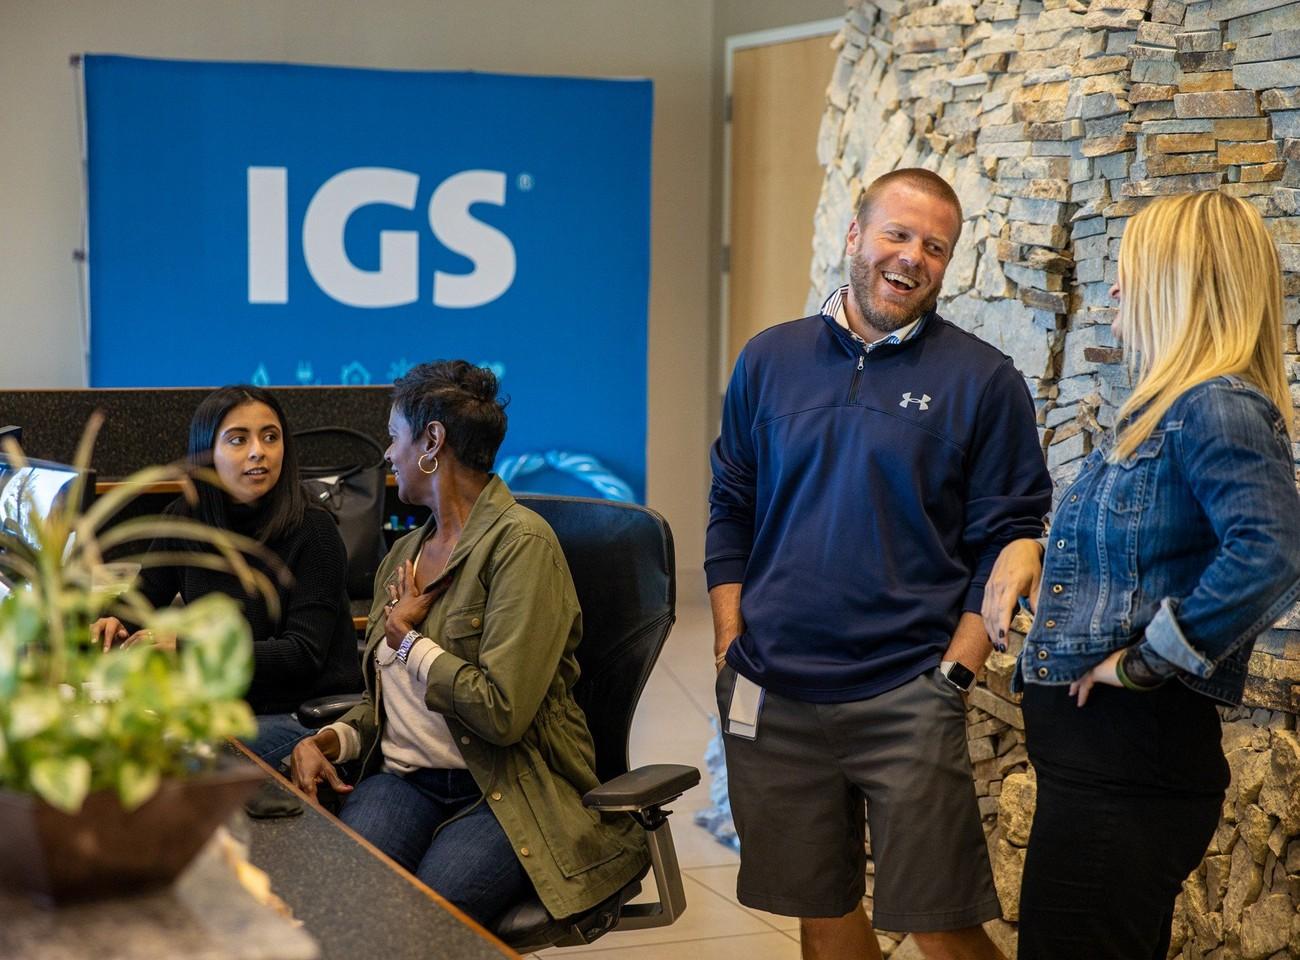 IGS Careers